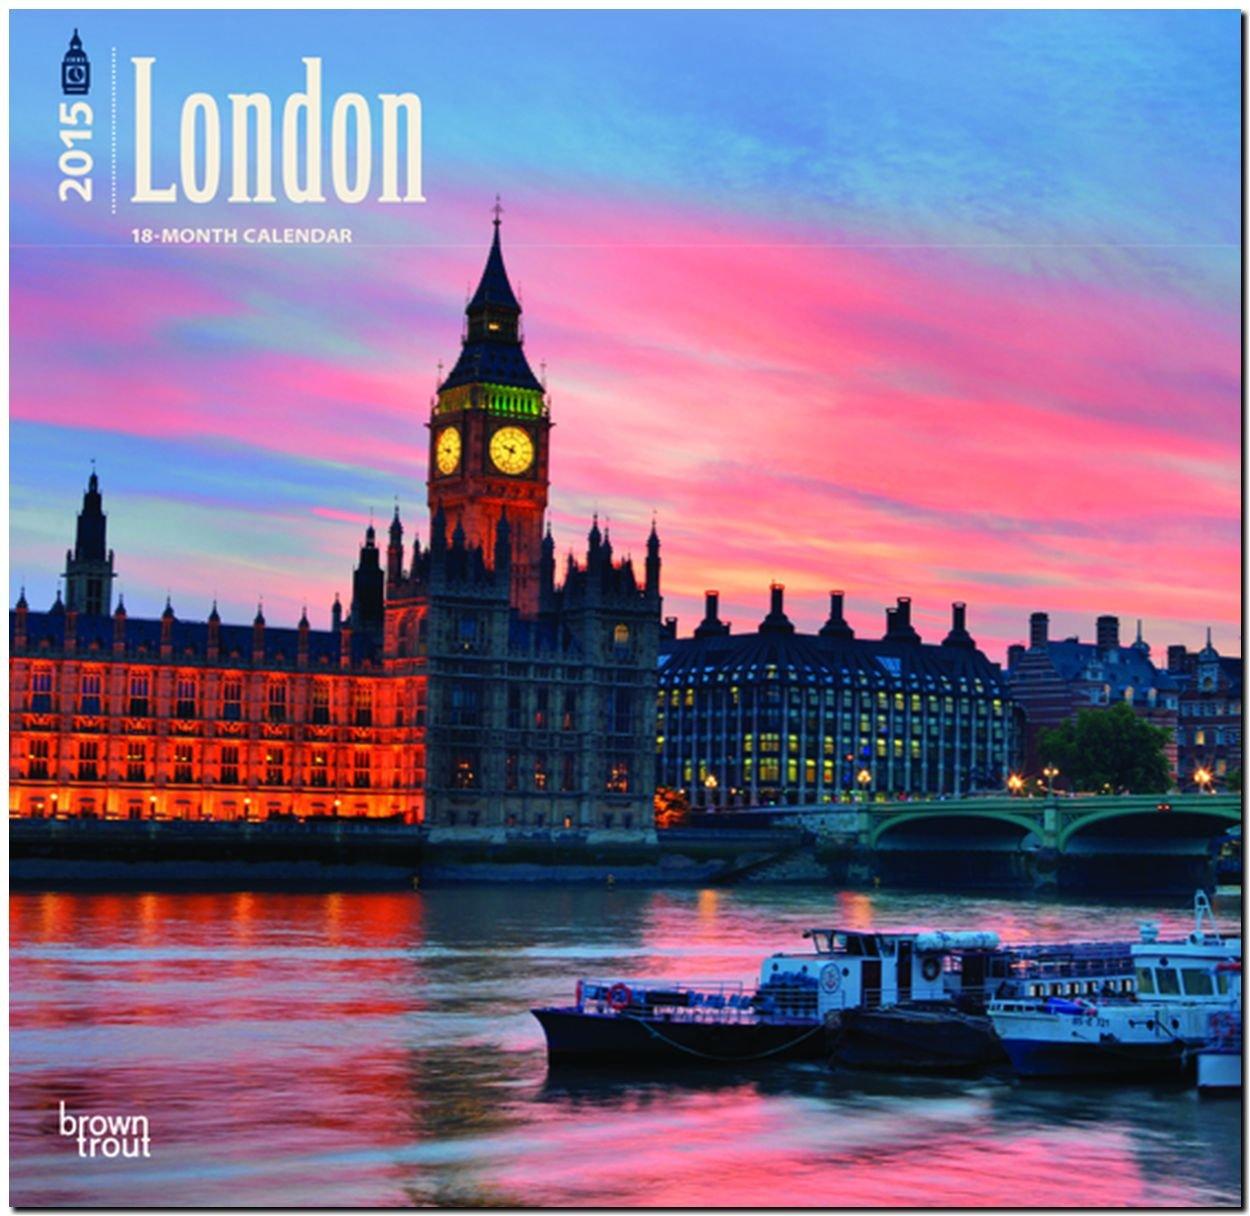 London 2015: Original BrownTrout-Kalender [Mehrsprachig] [Kalender]